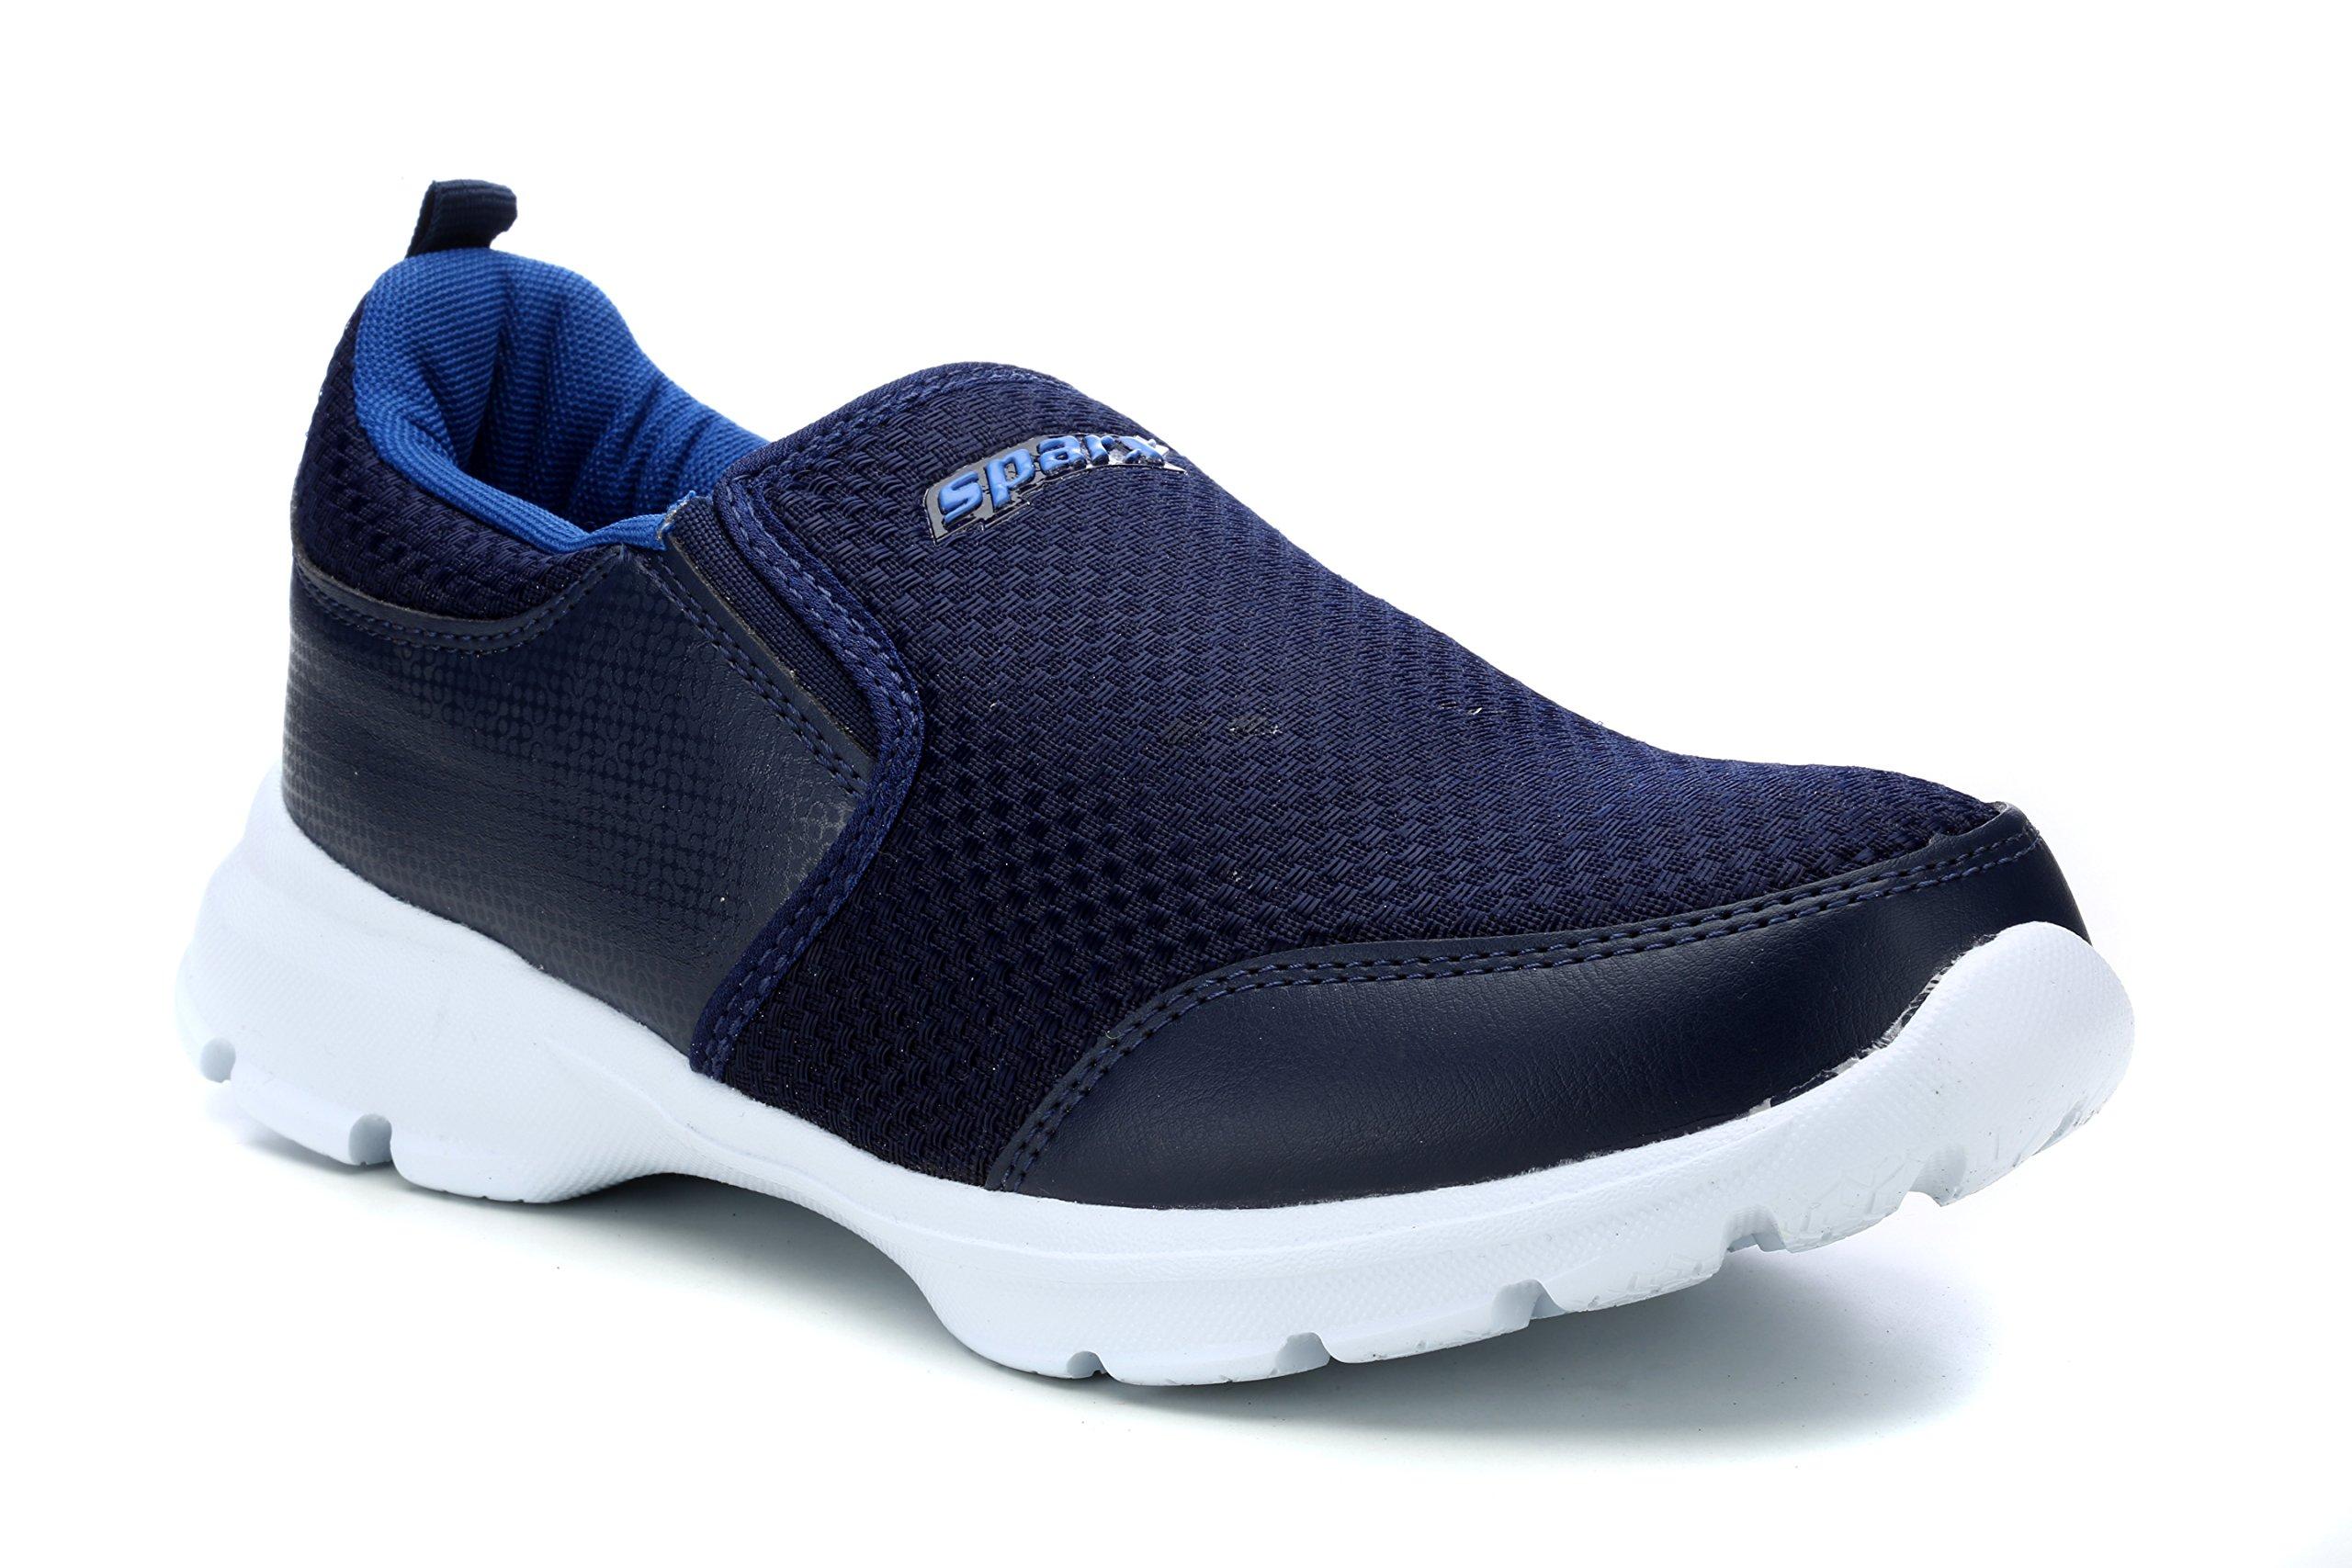 Sparx Men's Mesh Running Shoes- Buy